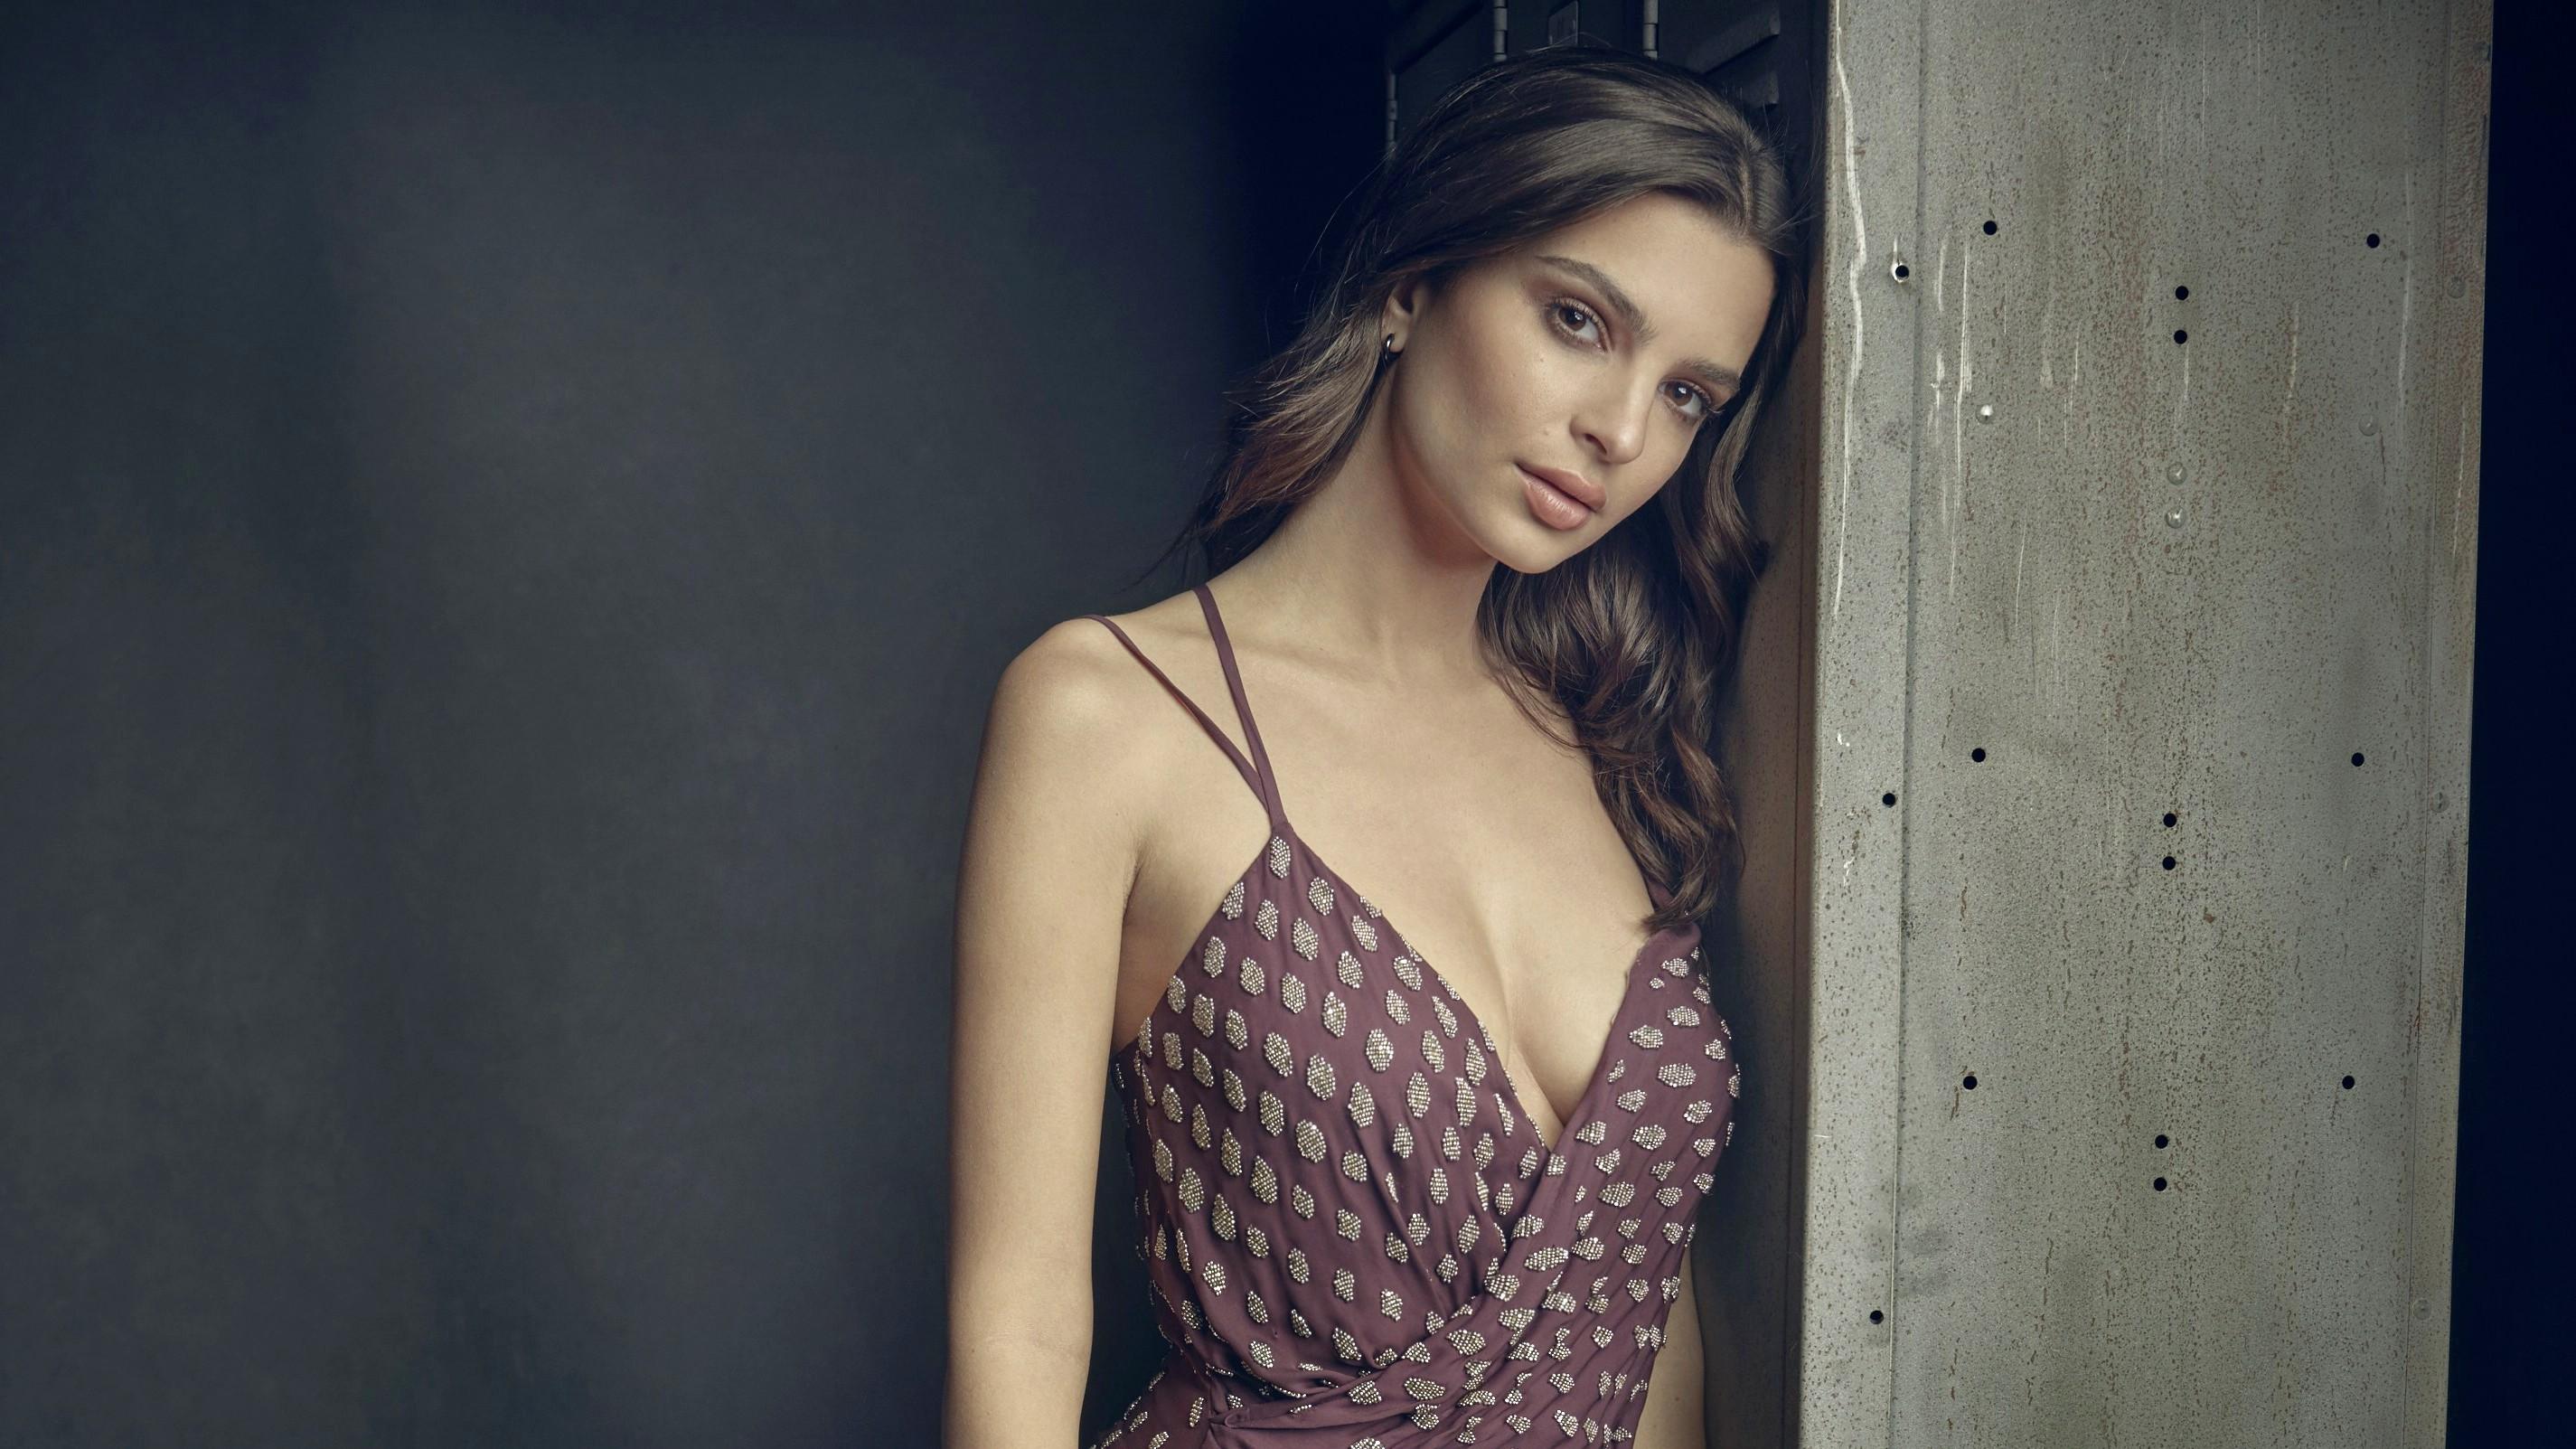 Top 10 beautiful women in the World, Emily Ratajkowski